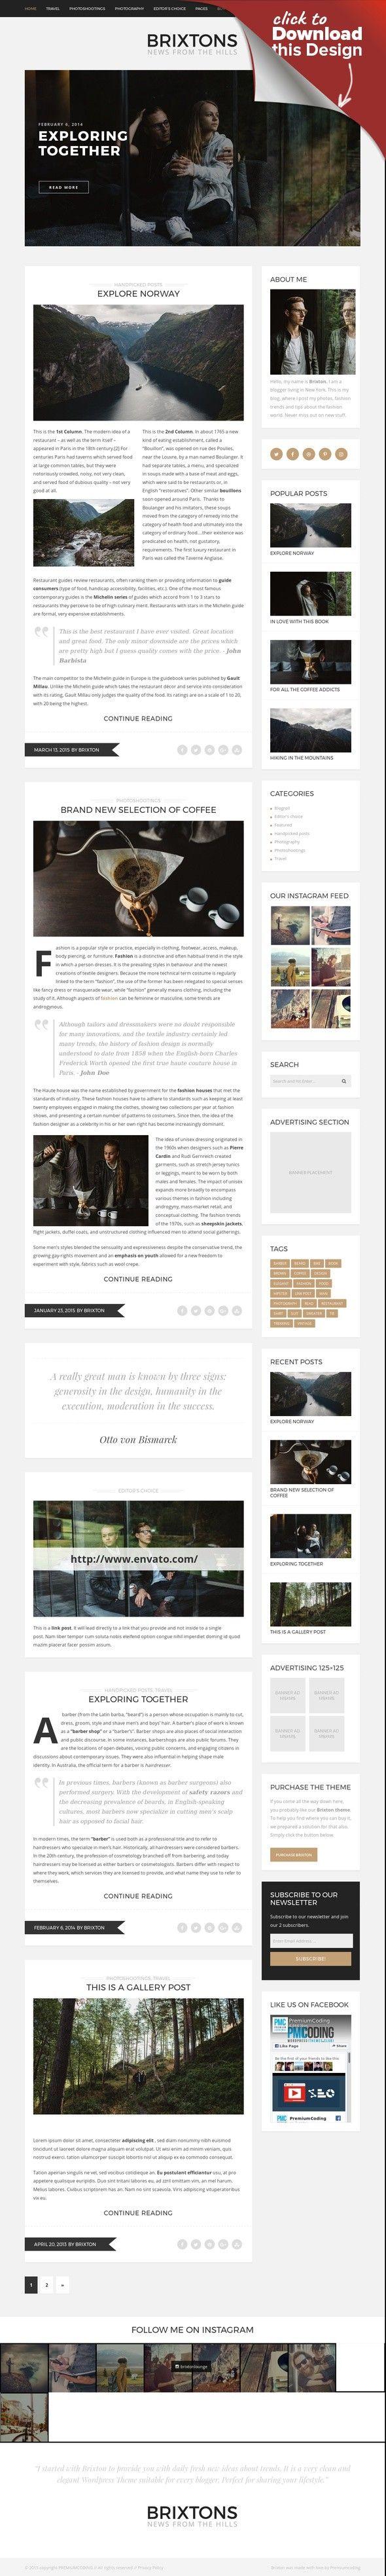 Brixton Blog - A Responsive WordPress Blog Theme | Wordpress blog ...